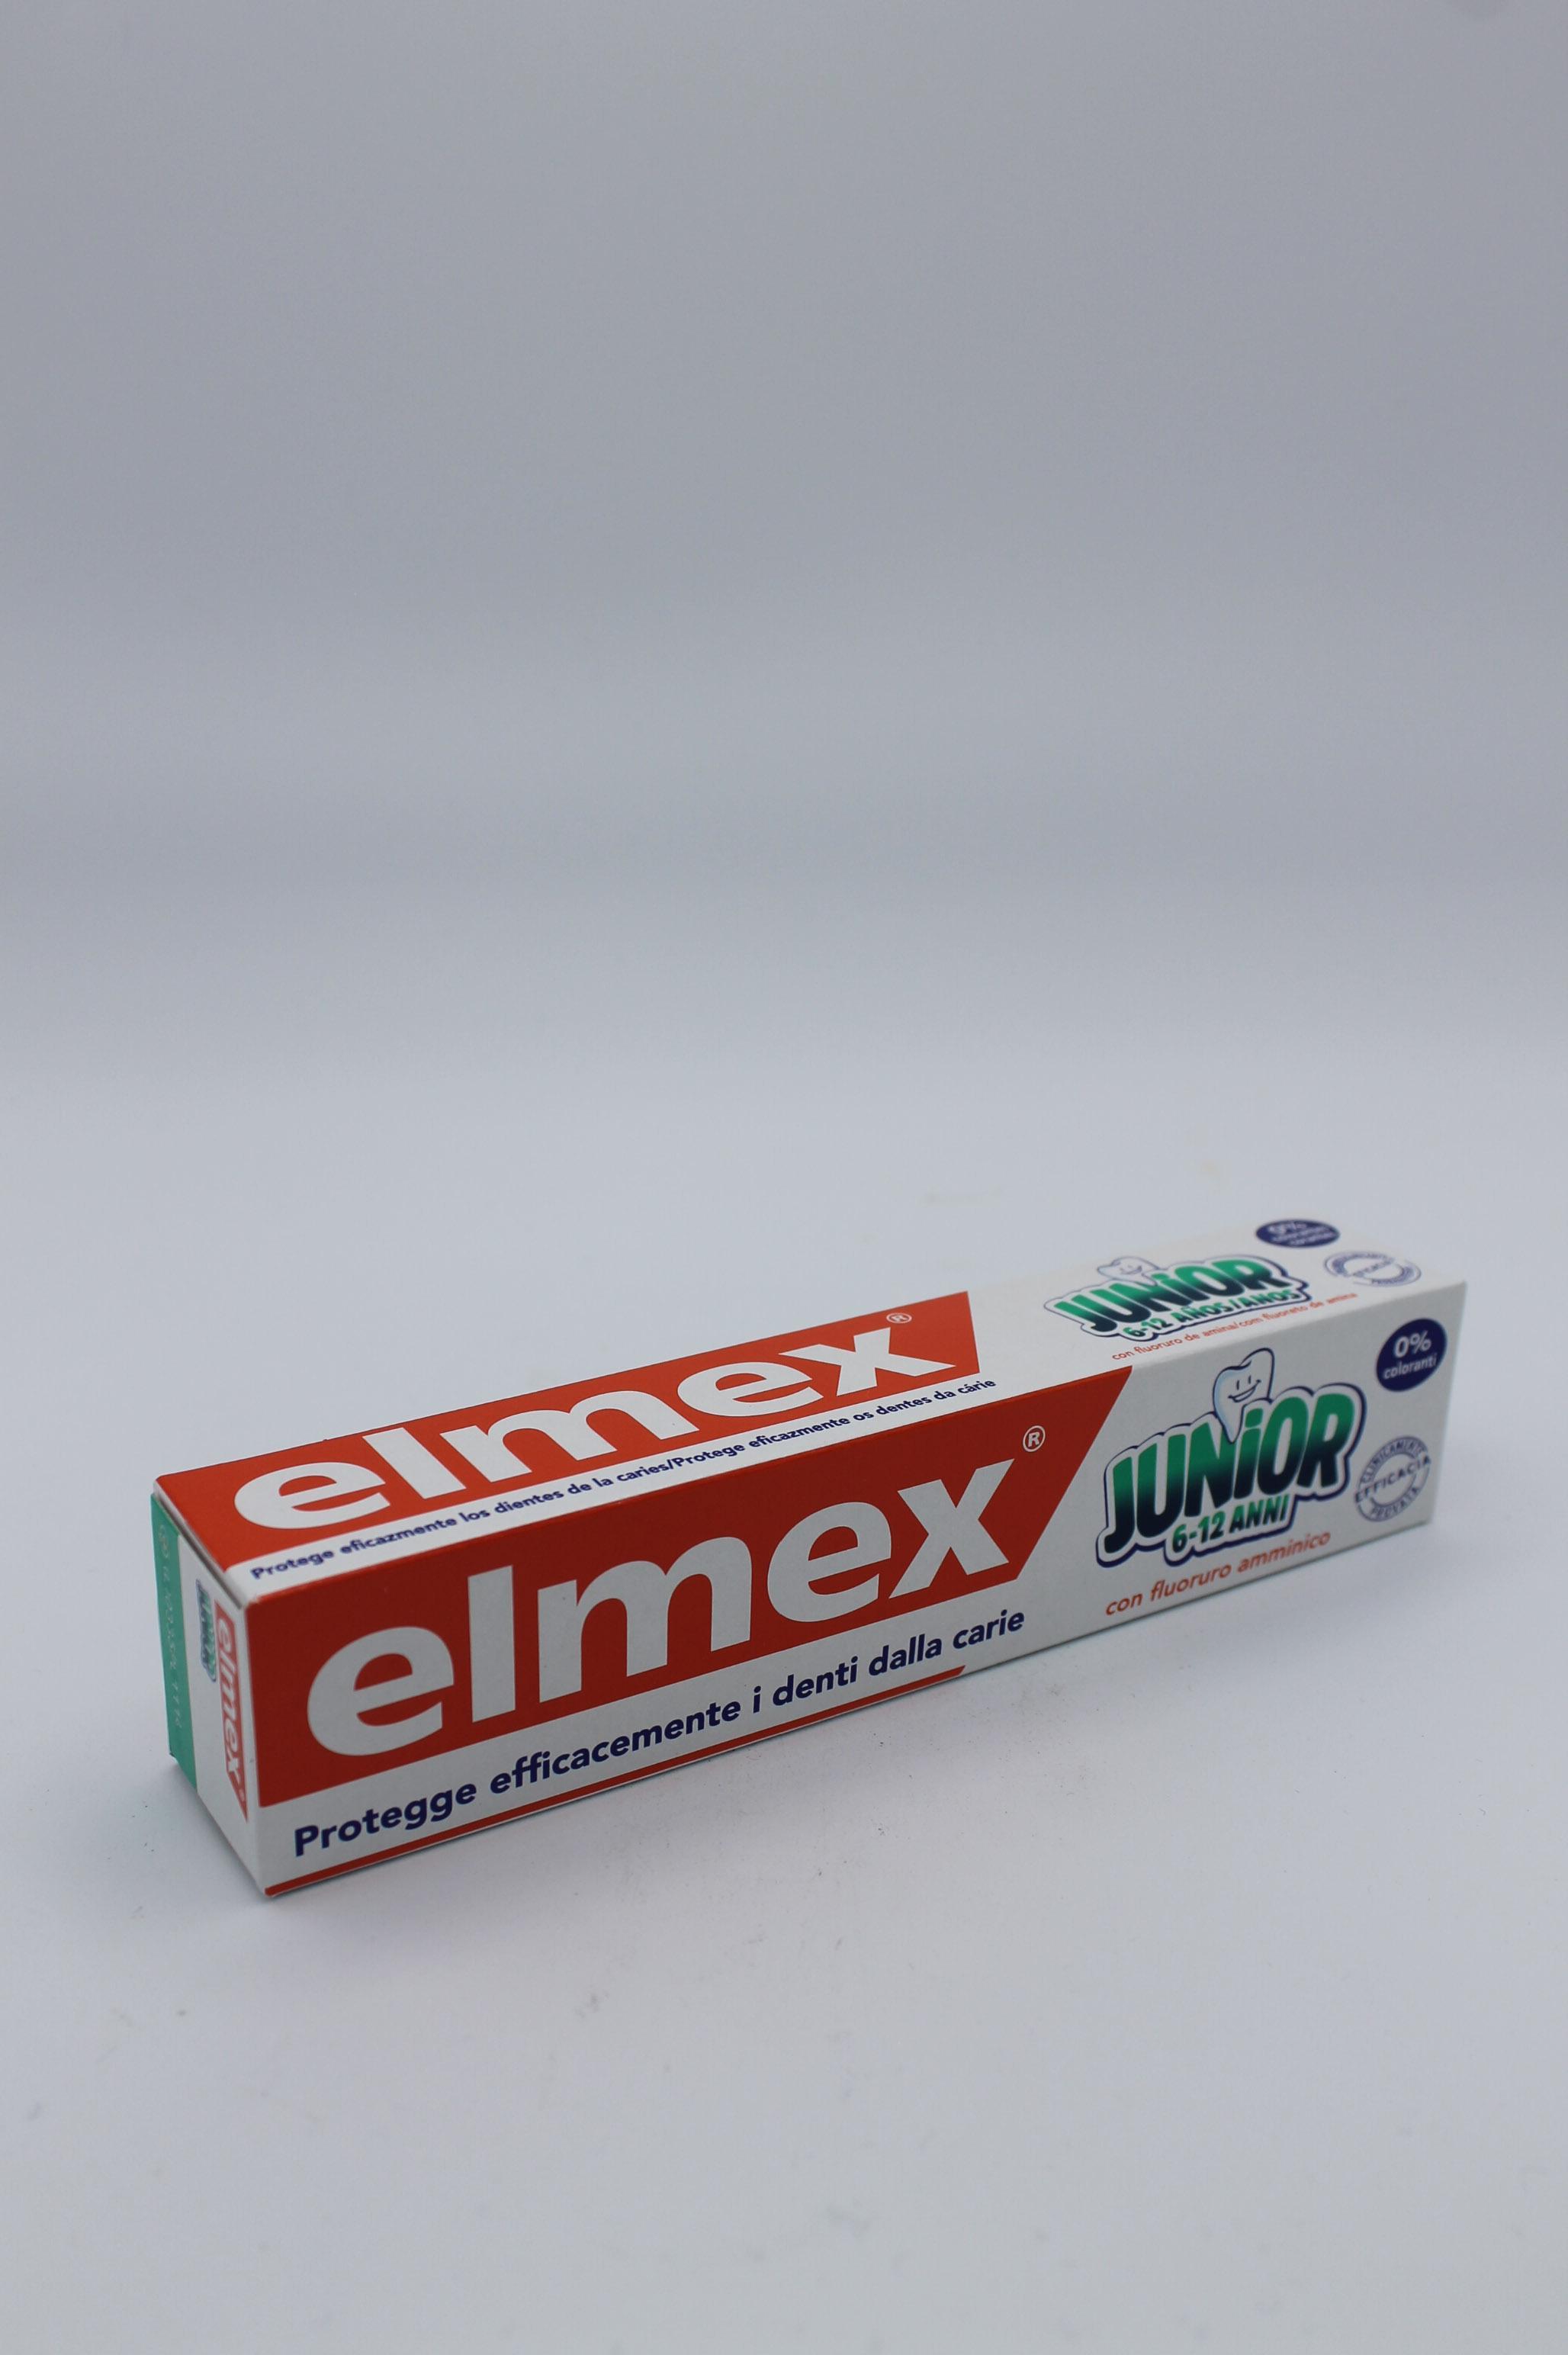 Elmex dentifricio junior tubo 75ml.